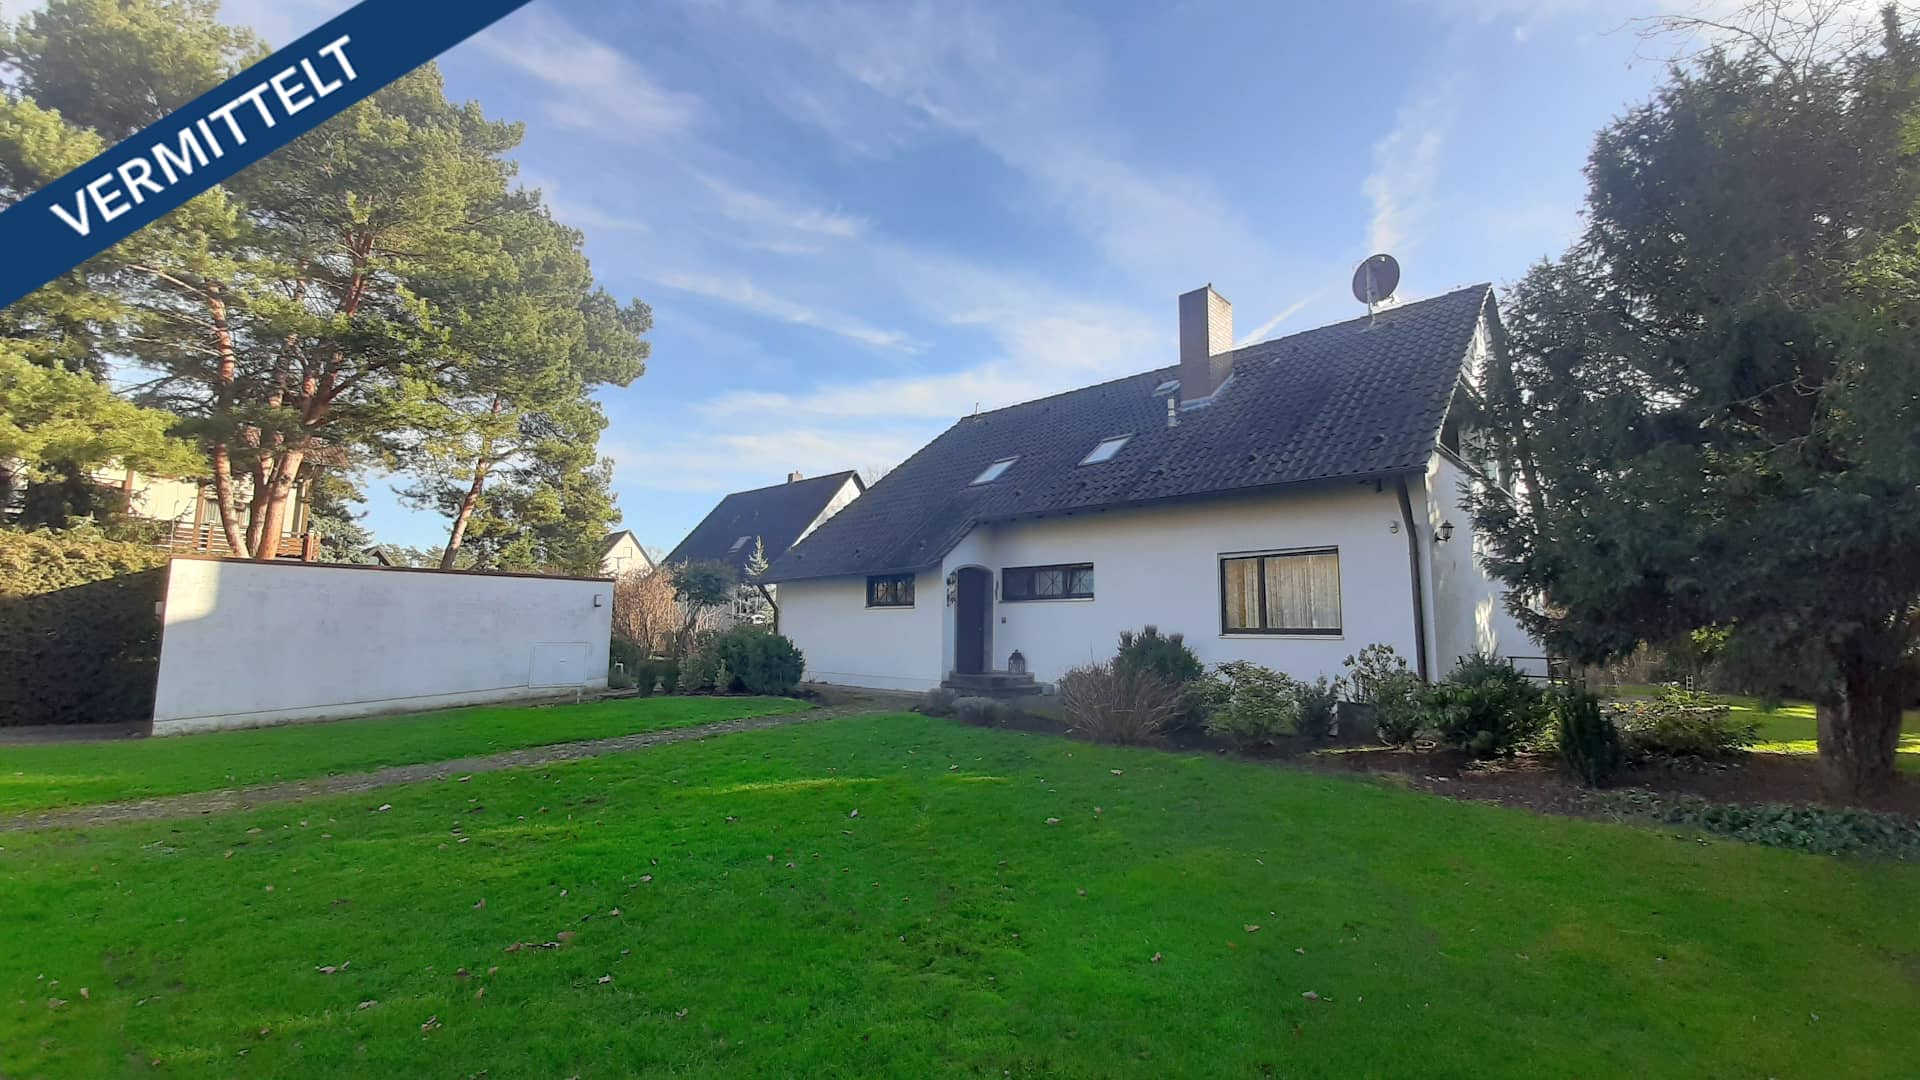 immobilienmakler_kitzingen_verkaufen-fexer-immobilien-kitzingen_Haus-Frontansicht_vermittelt_001